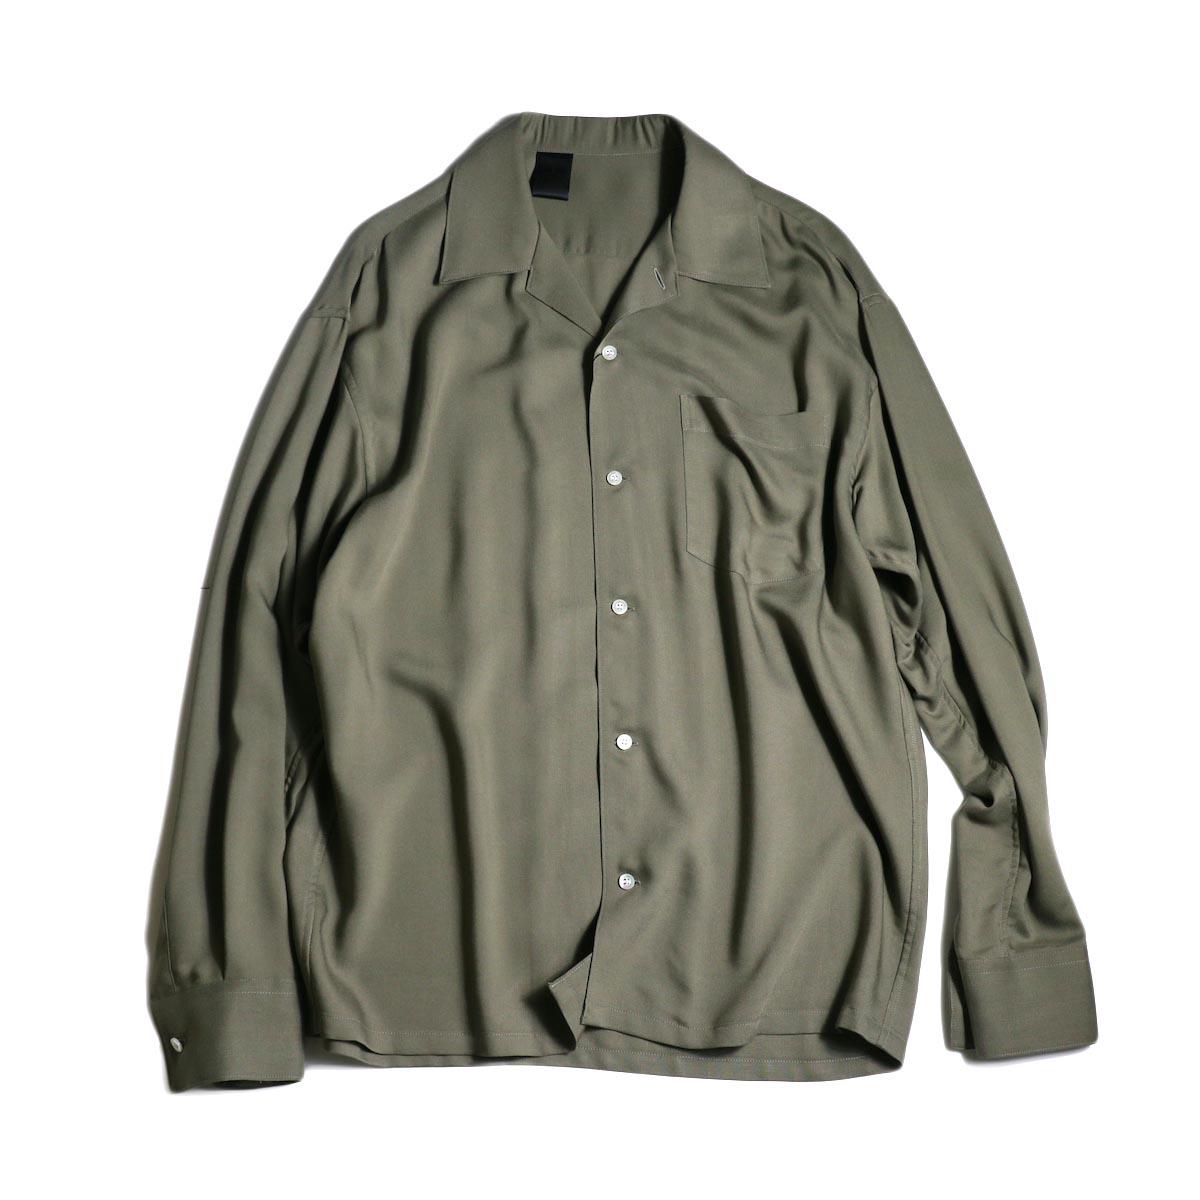 N.HOOLYWOOD / 2201-SH06 Open Collar Shirt (Charcoal)